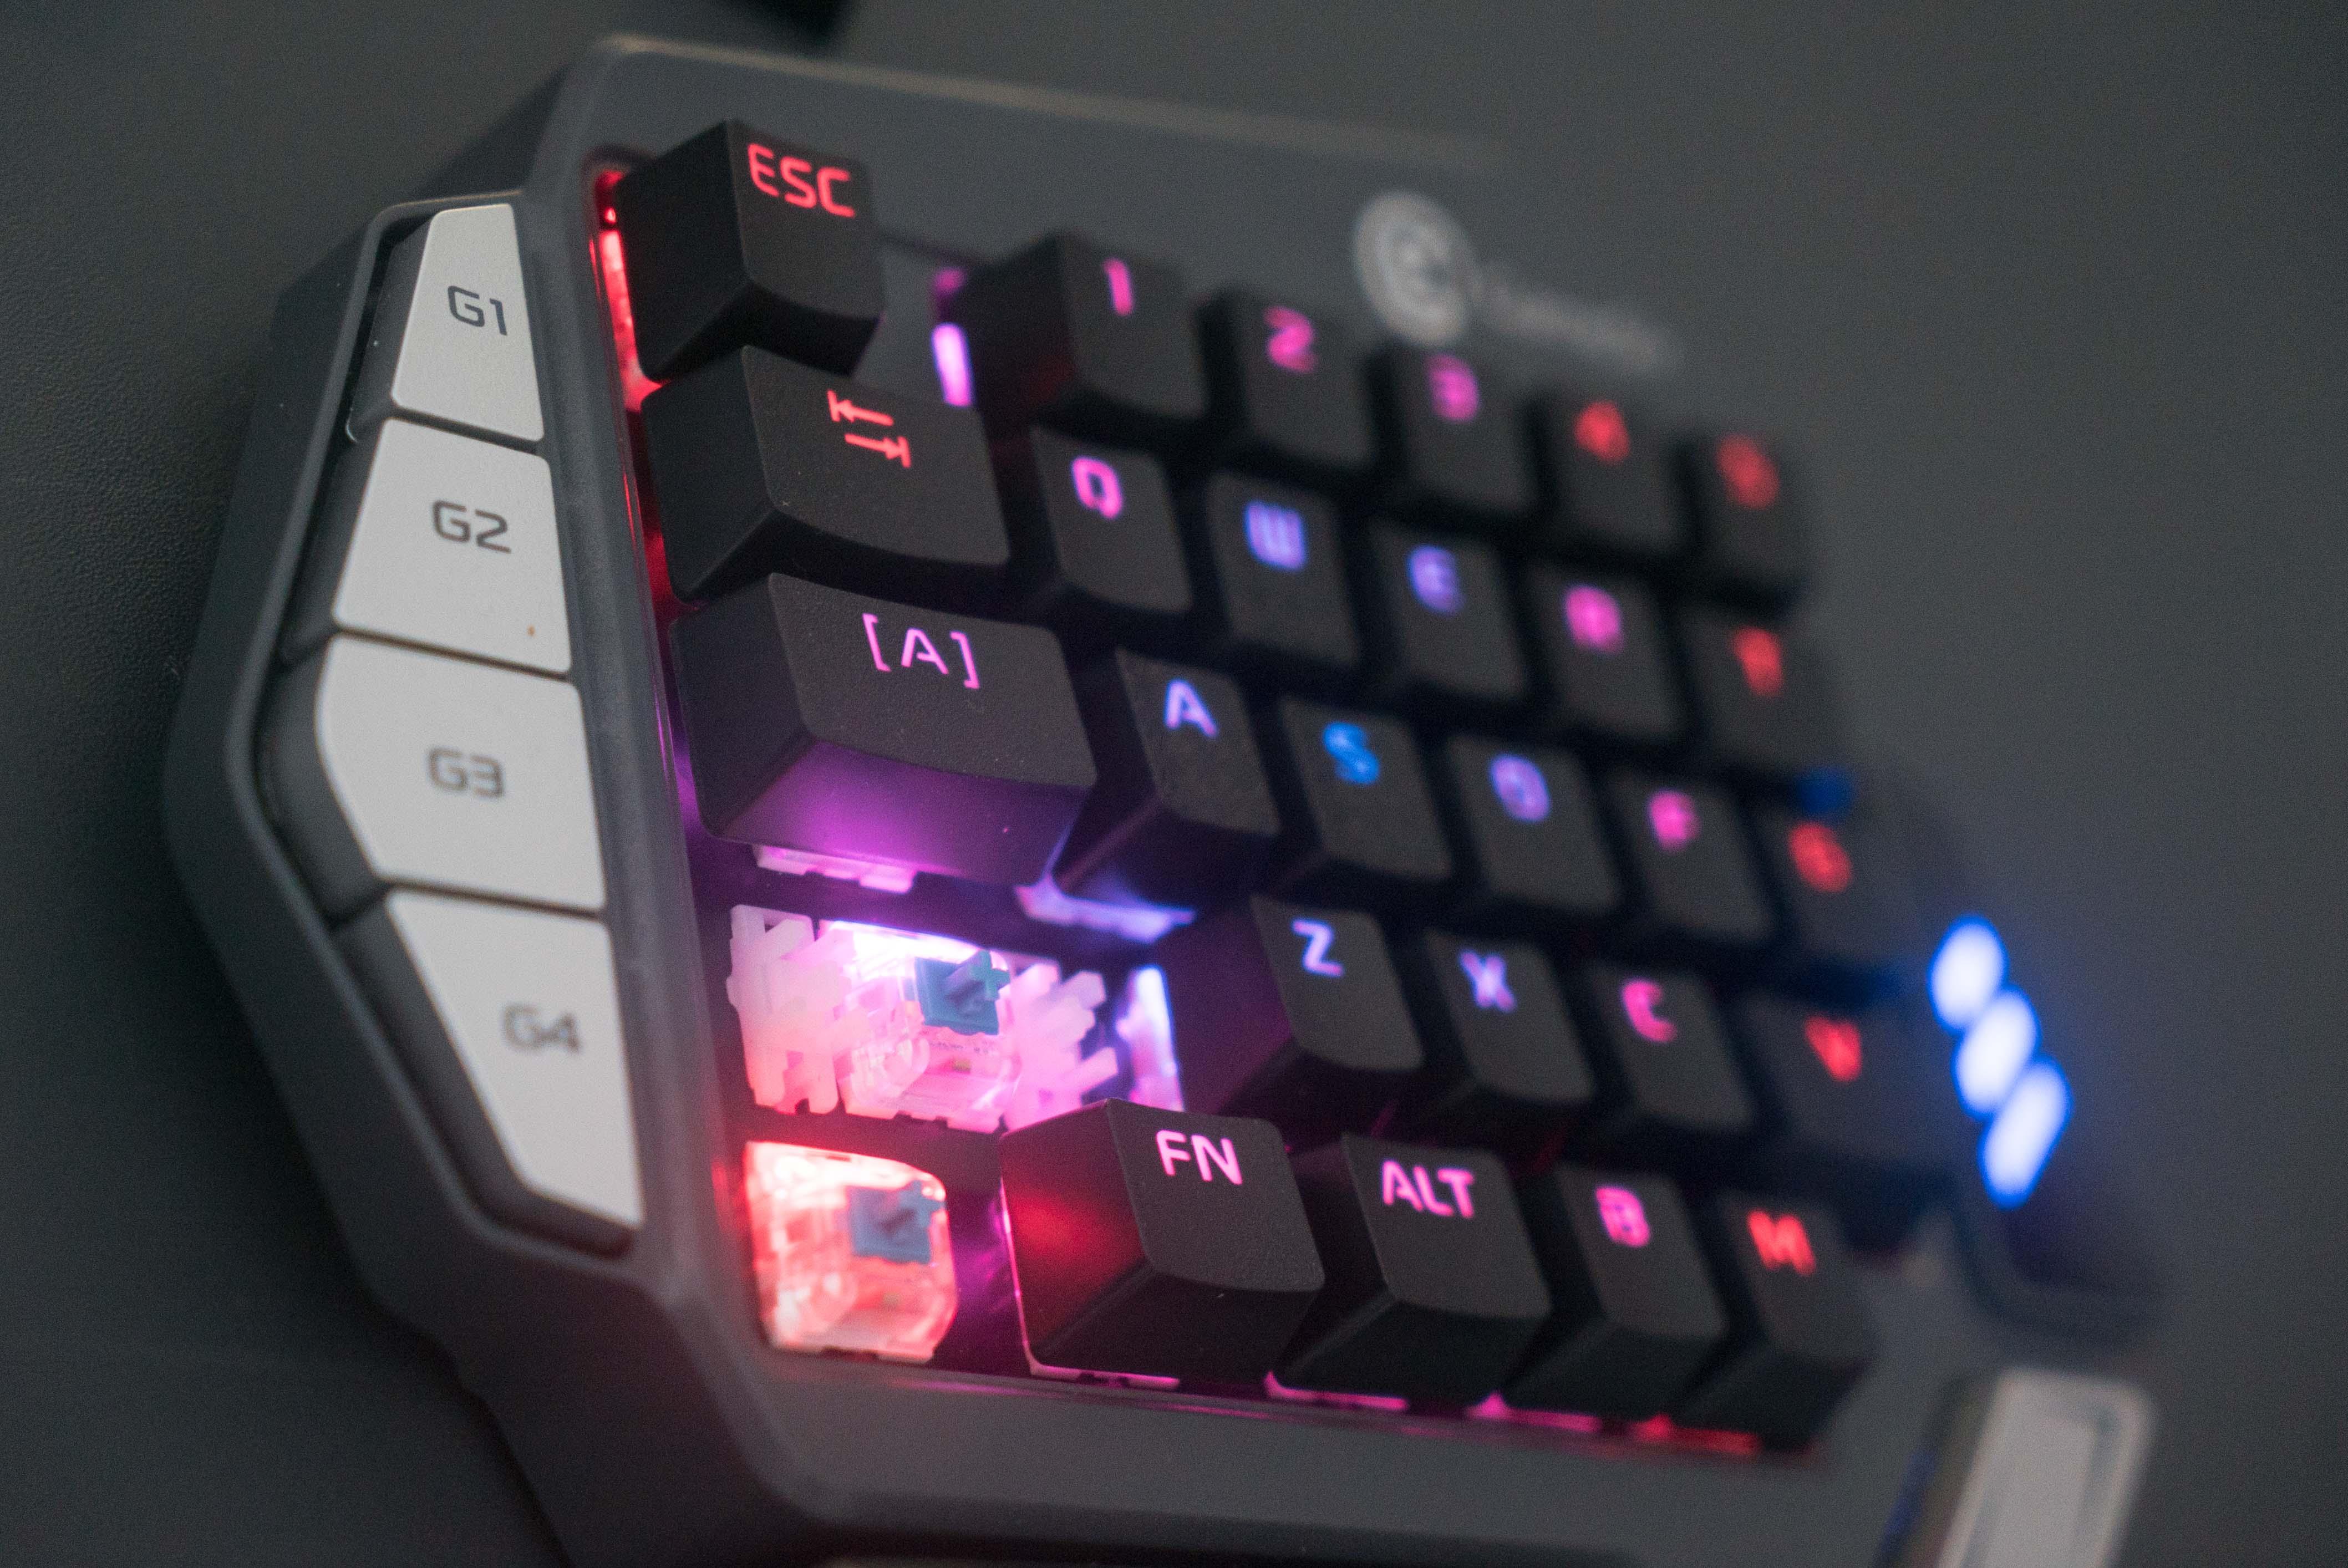 Gamesir's Z1 Keypad by CJ Wang